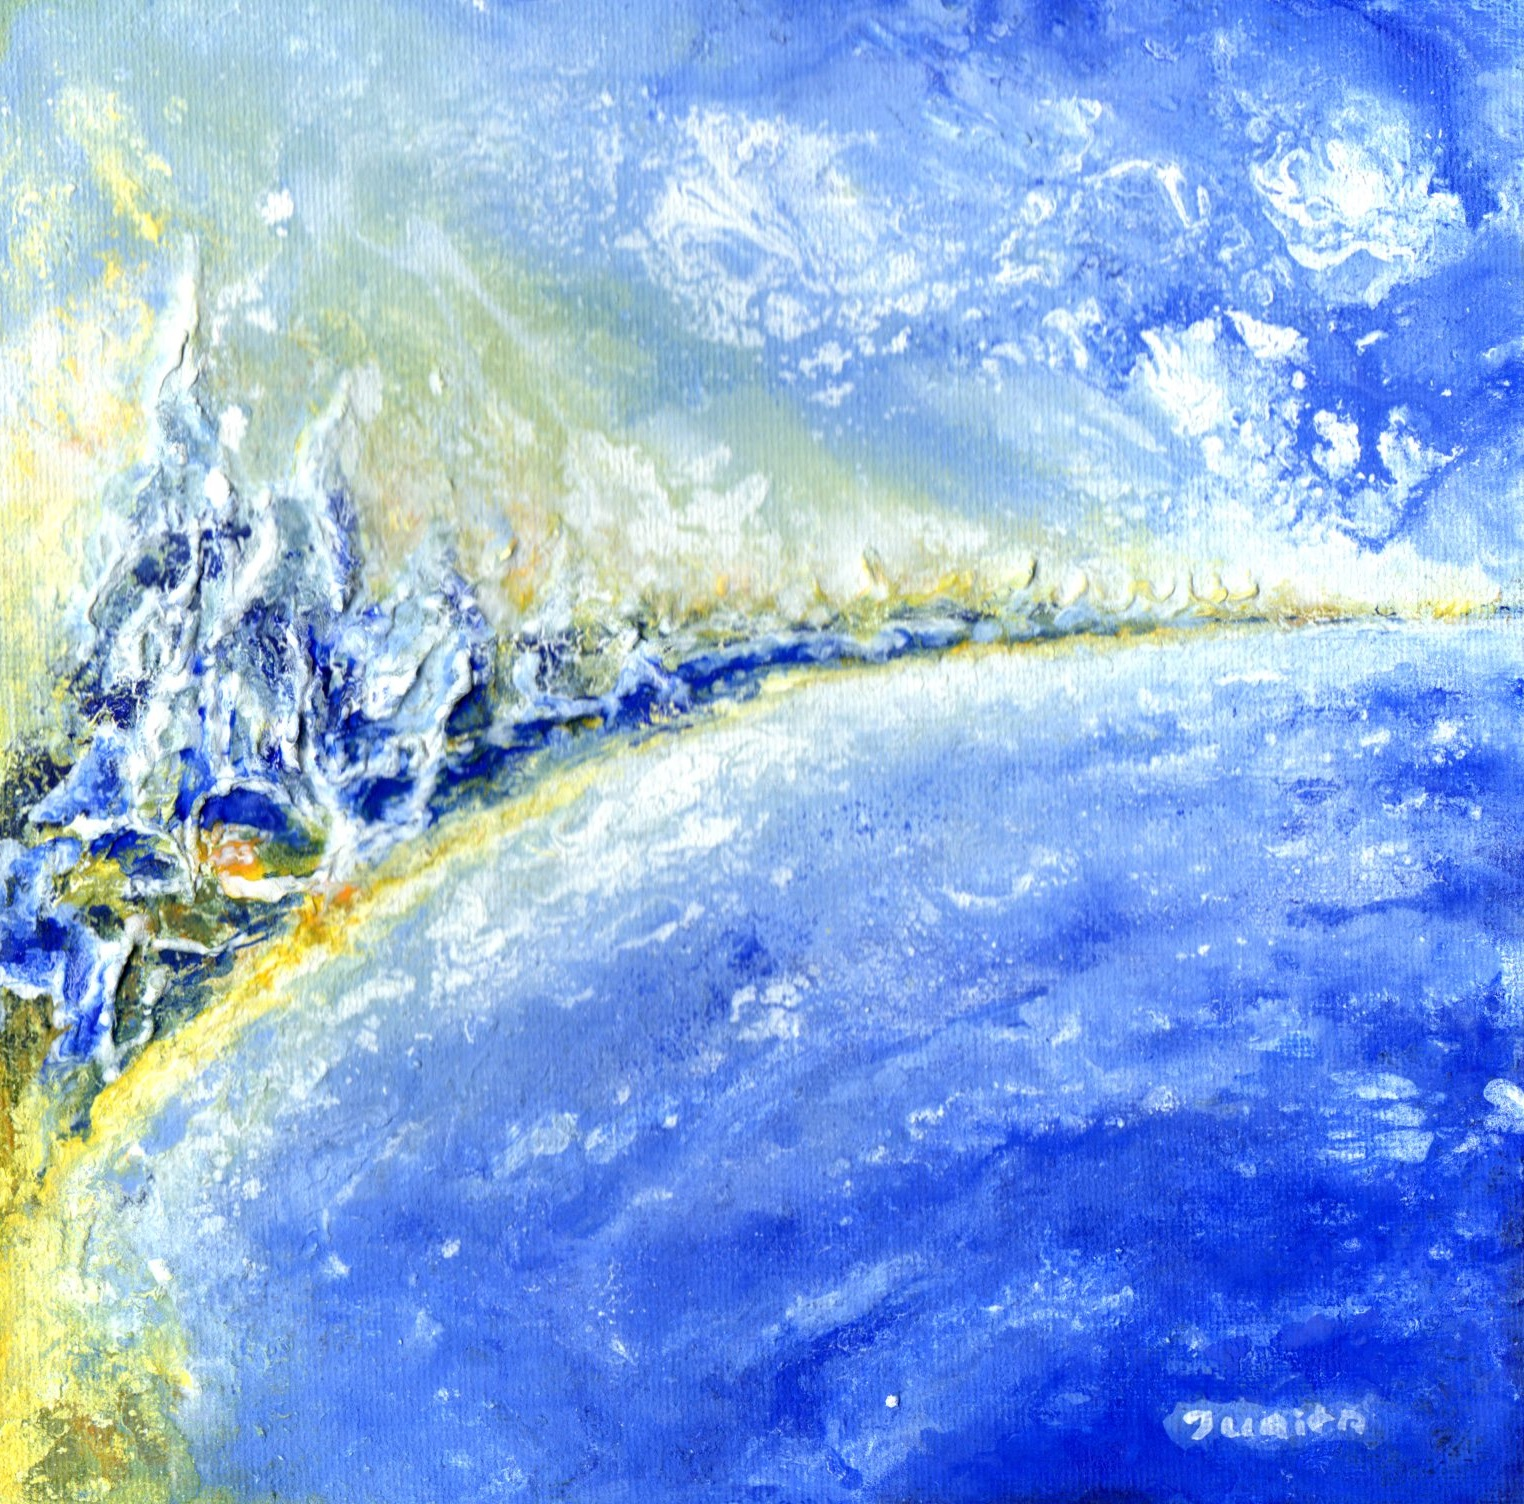 ocean mystery-jurita-2020-acrylic-20x20cm (4)